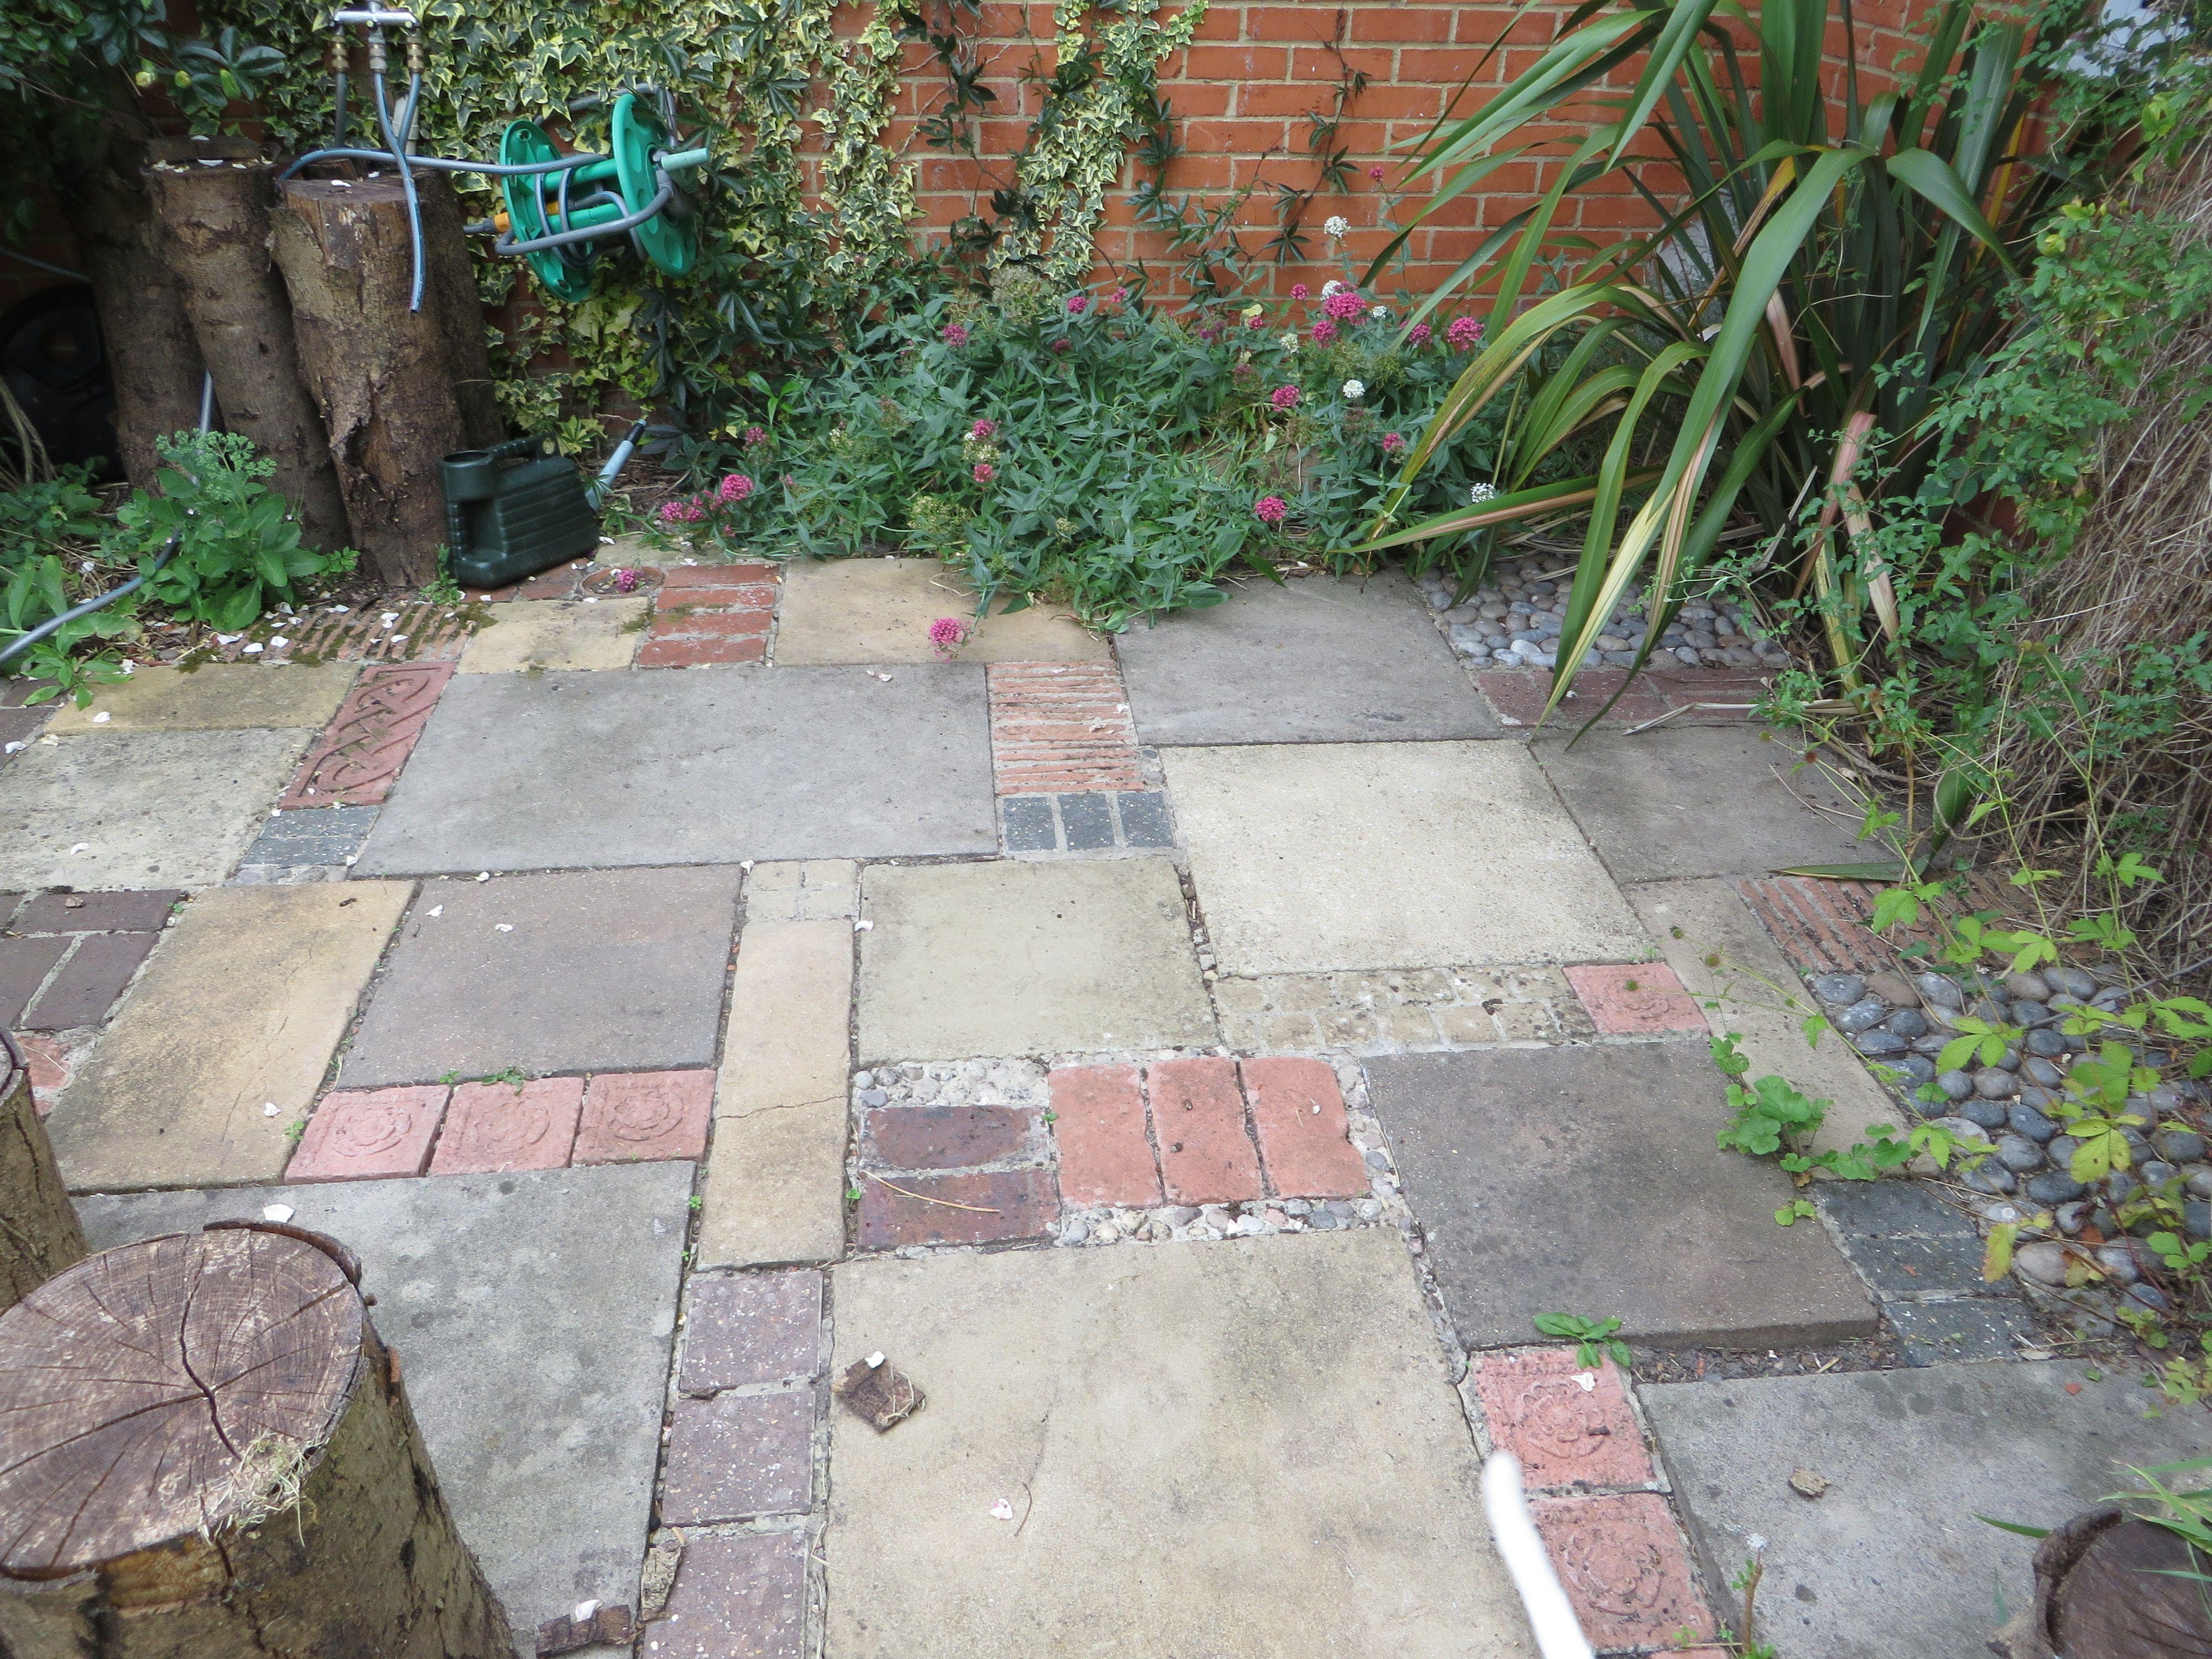 Patio With Inspiration From Geoff Hamilton Backyard Landscaping Garden Plants Design Garden Floor